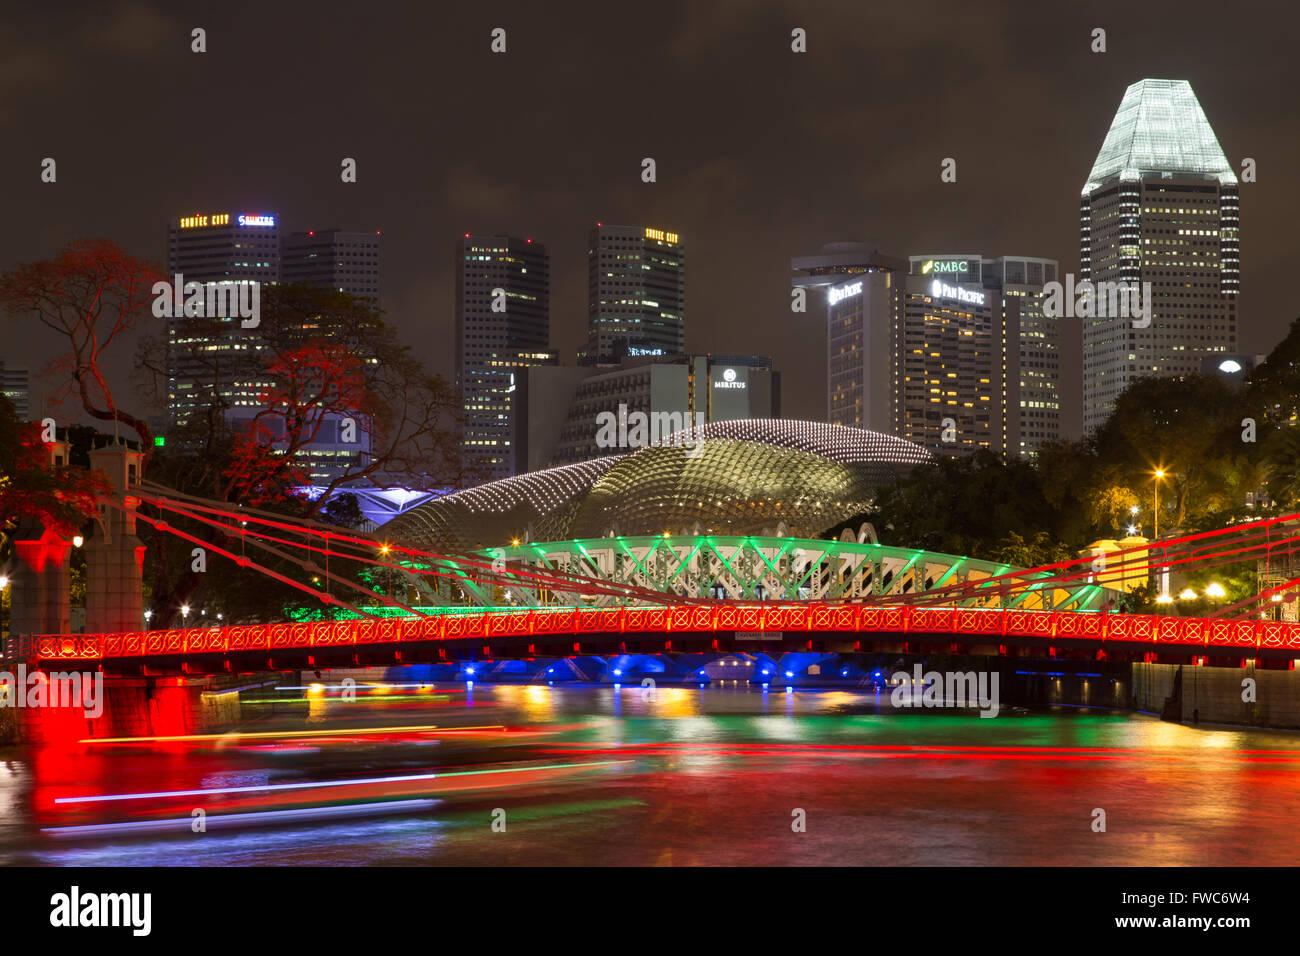 Singapore, Singapore - February 02, 2015: Famous Cavenagh bridge by night - Stock Image